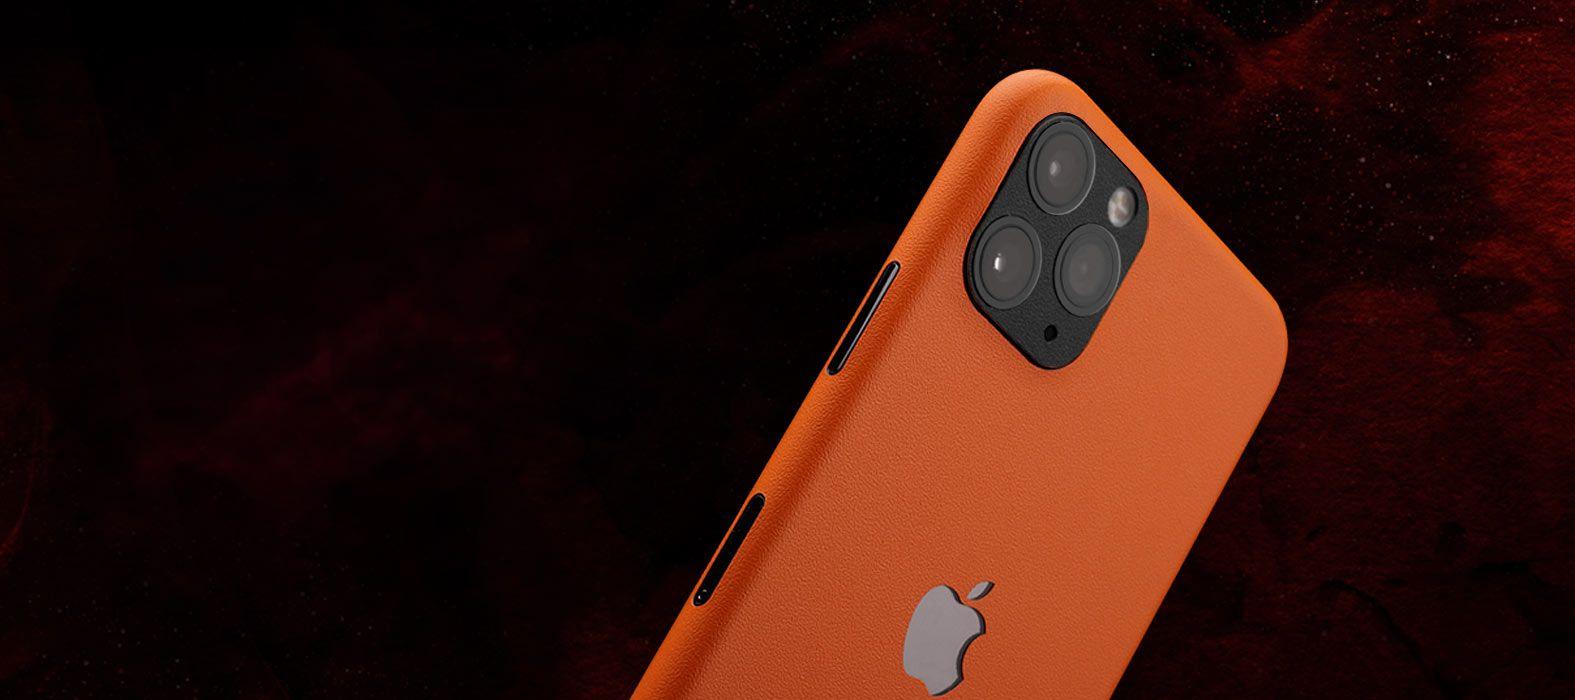 iPhone 11 Pro Sandstone orange skins